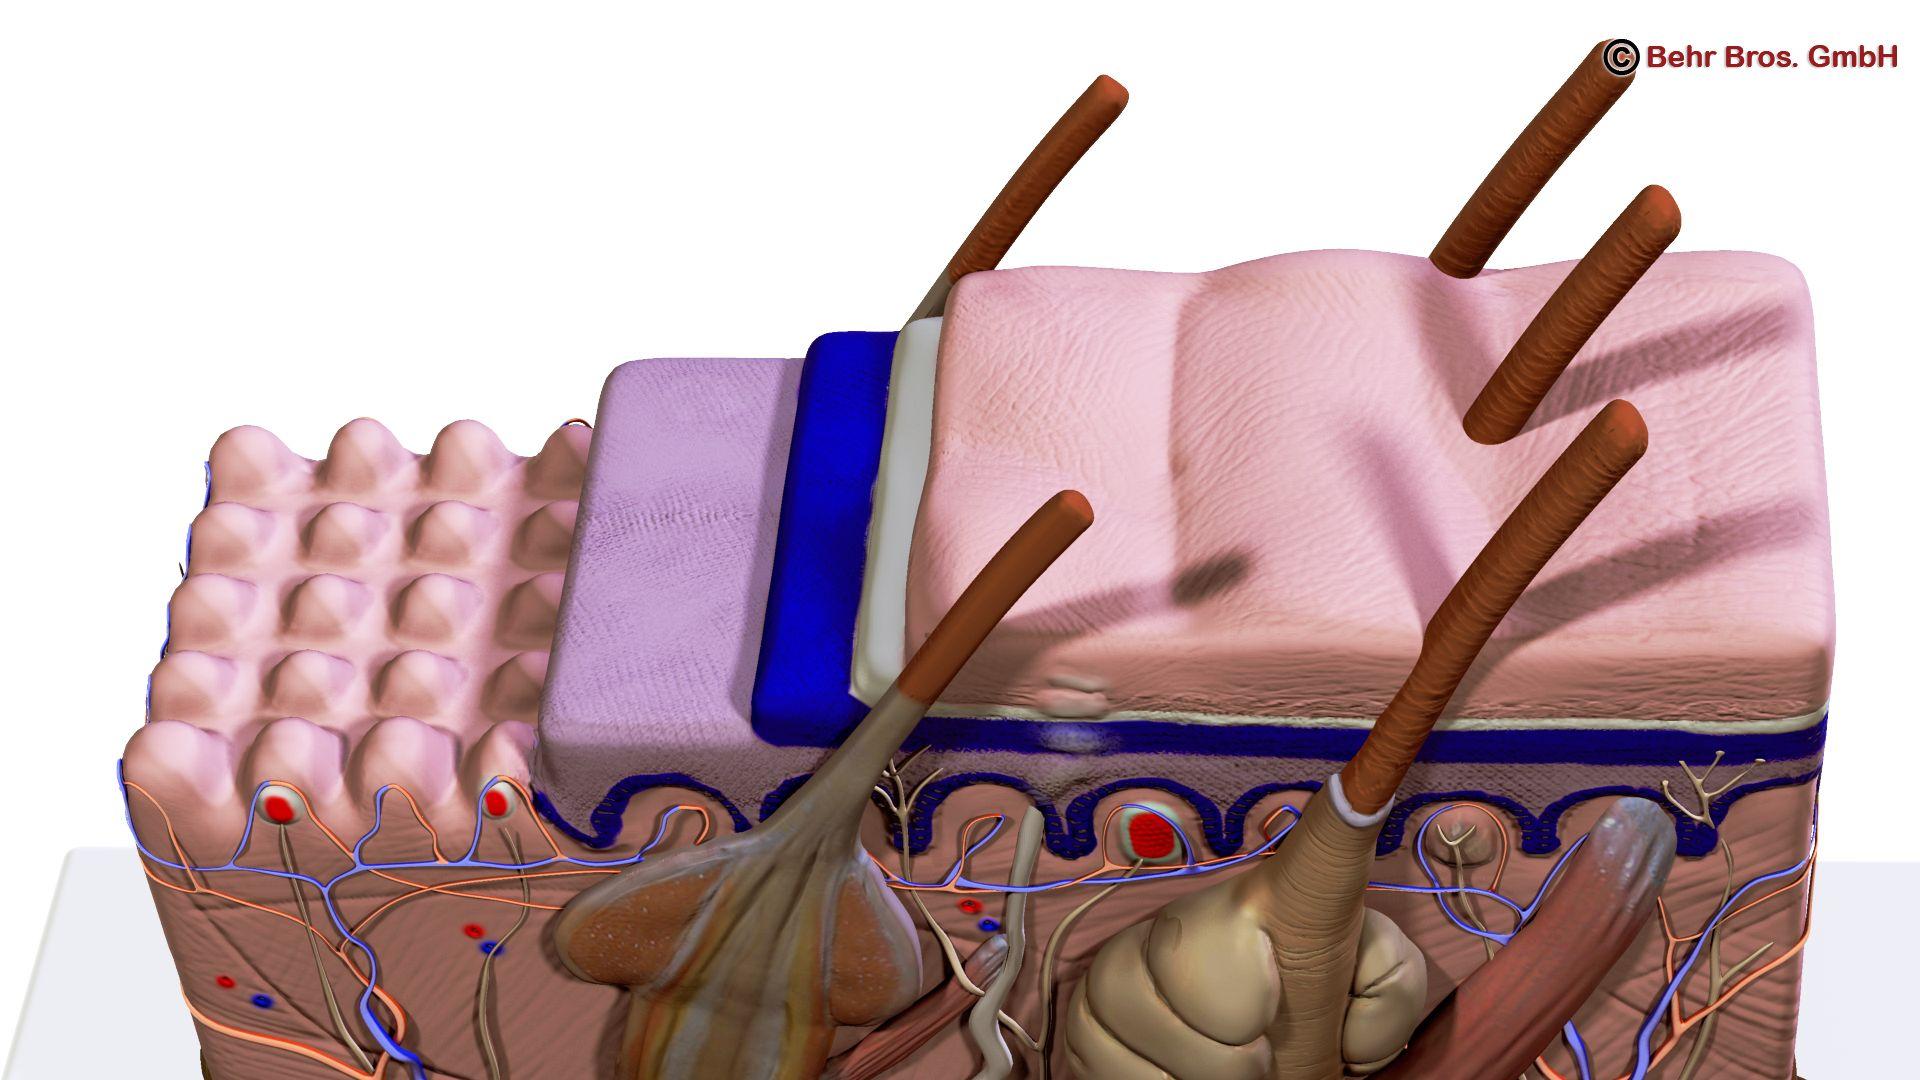 Human Skin Section 3d model 3ds max fbx c4d lwo lws lw ma mb obj 161729